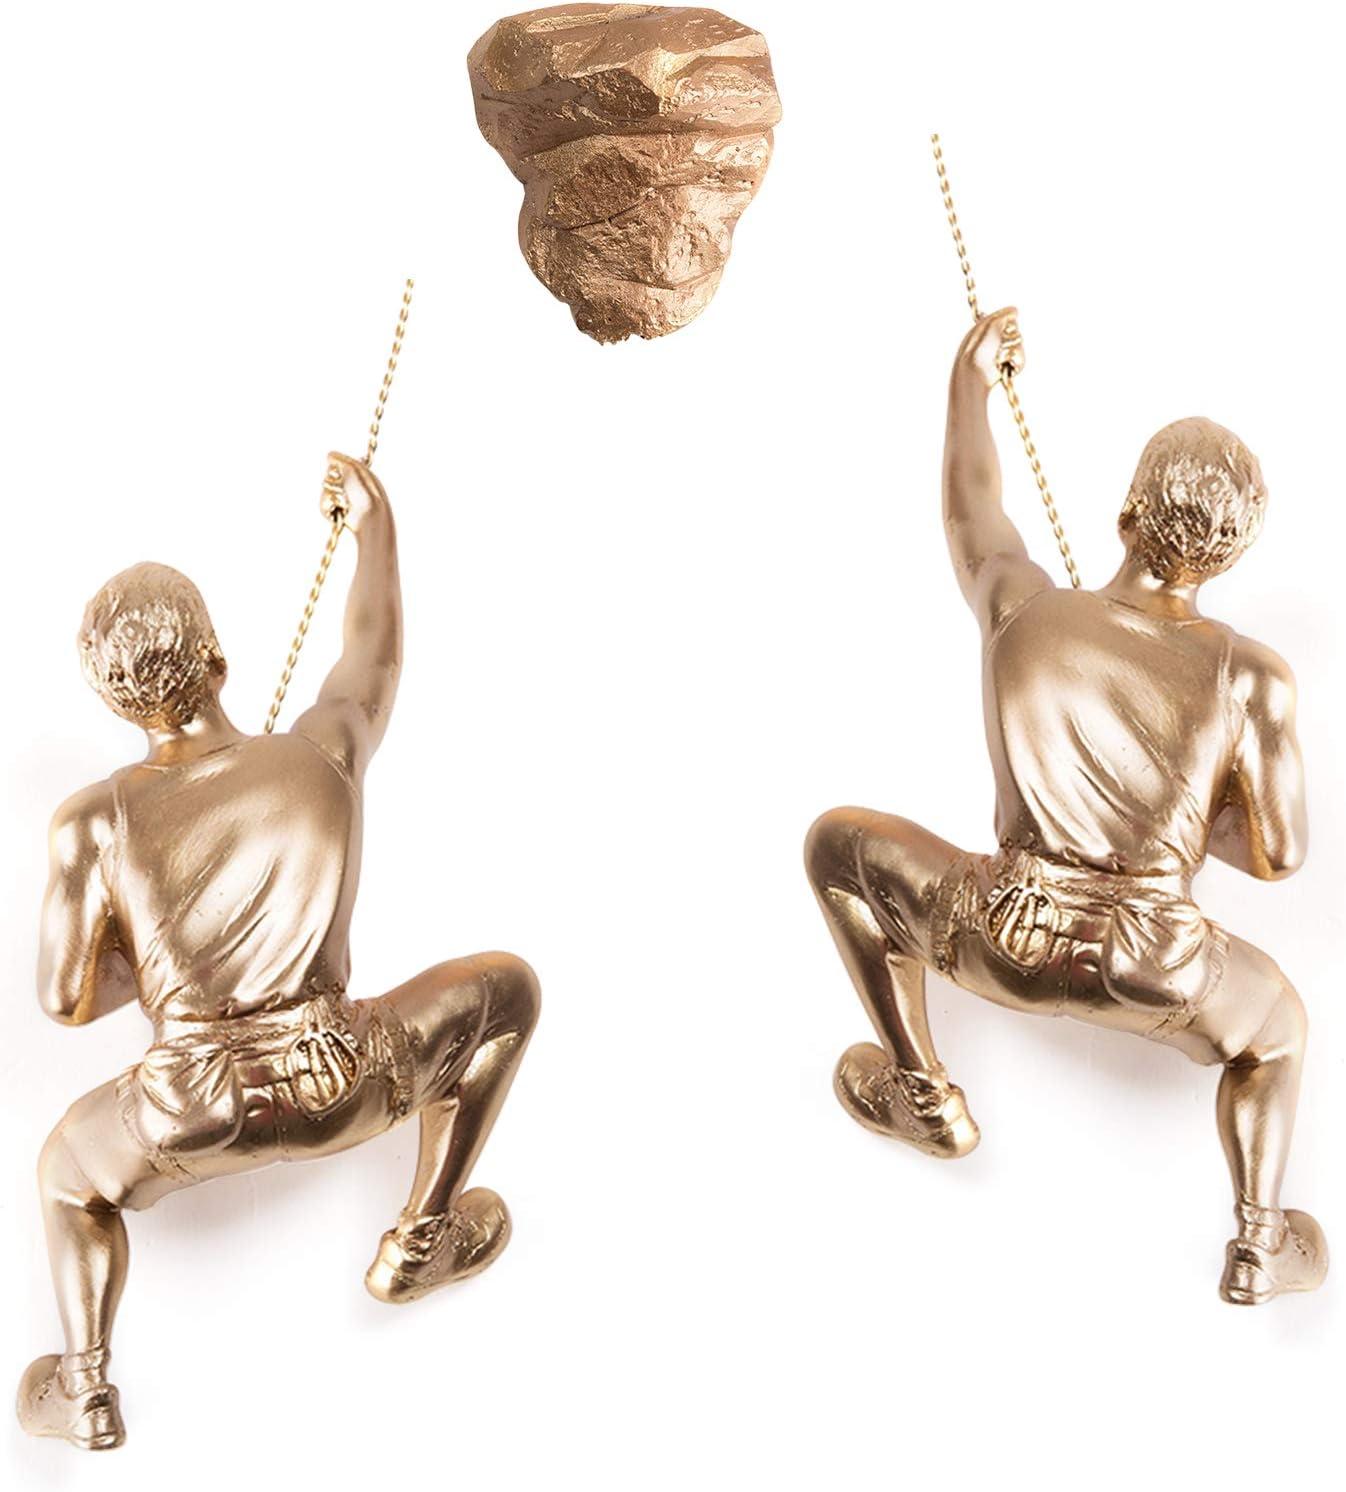 Olpchee Men Climbing Wall Sculpture Resin Art Wall Sculptures Home Decor Vintage Statue Figure Kit for Home Office Shop 3Pcs/Set (Gold)